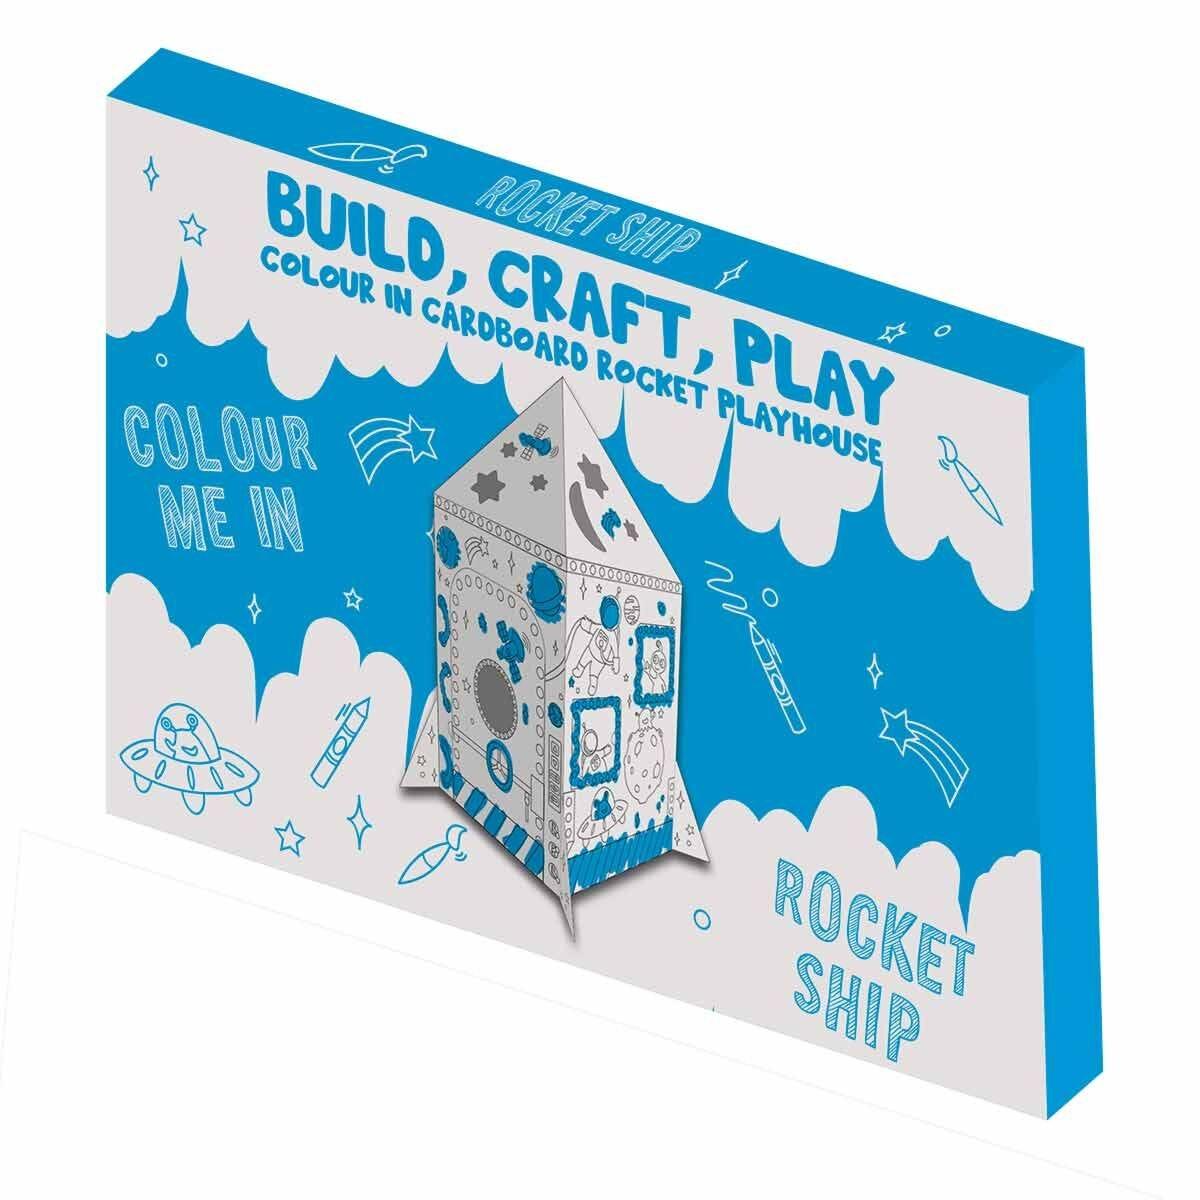 Colour Me In Cardboard Rocket